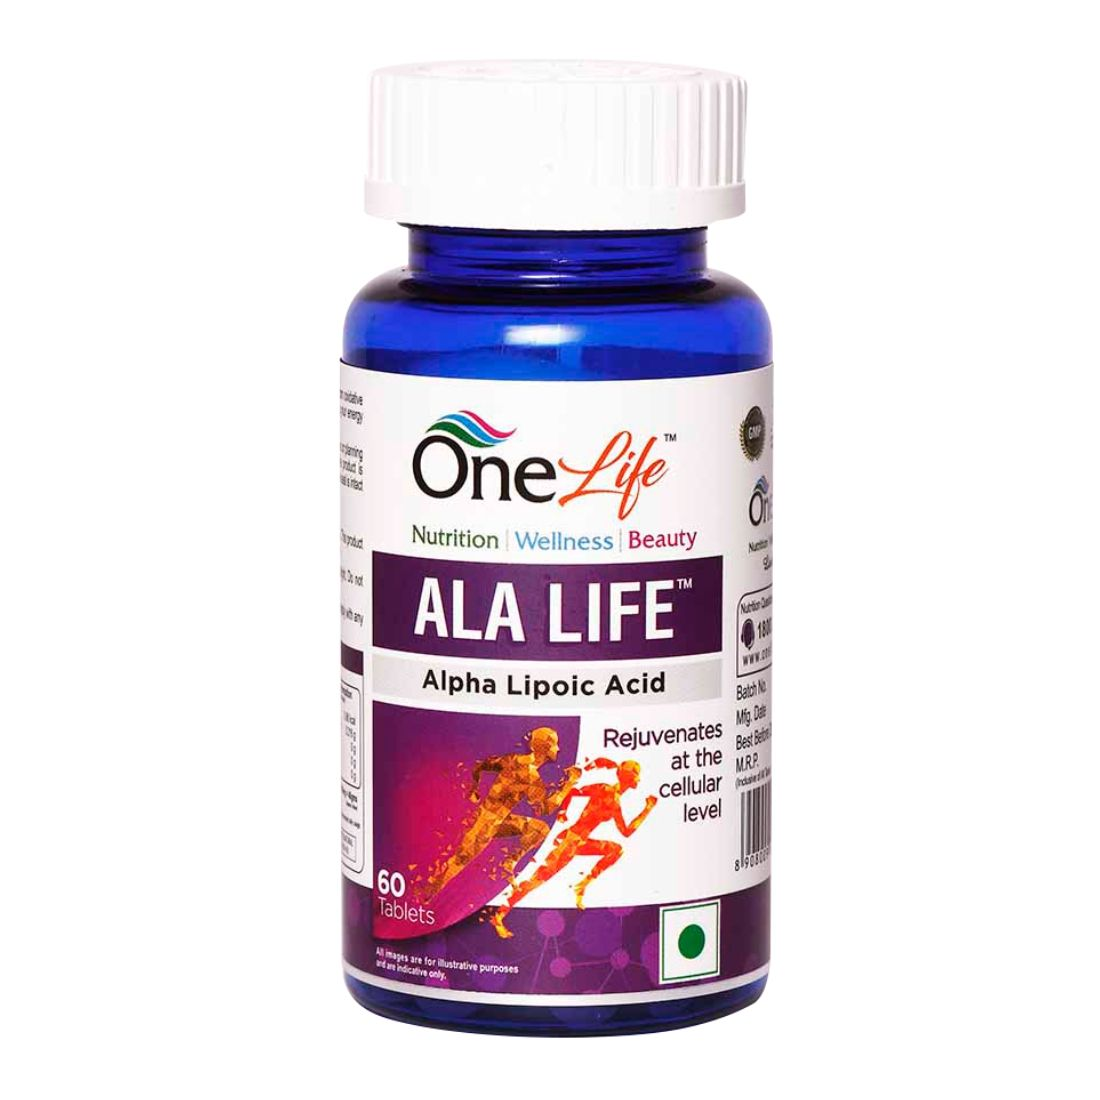 OneLife ALA Life Alpha Lipoic Acid 60 Tablets